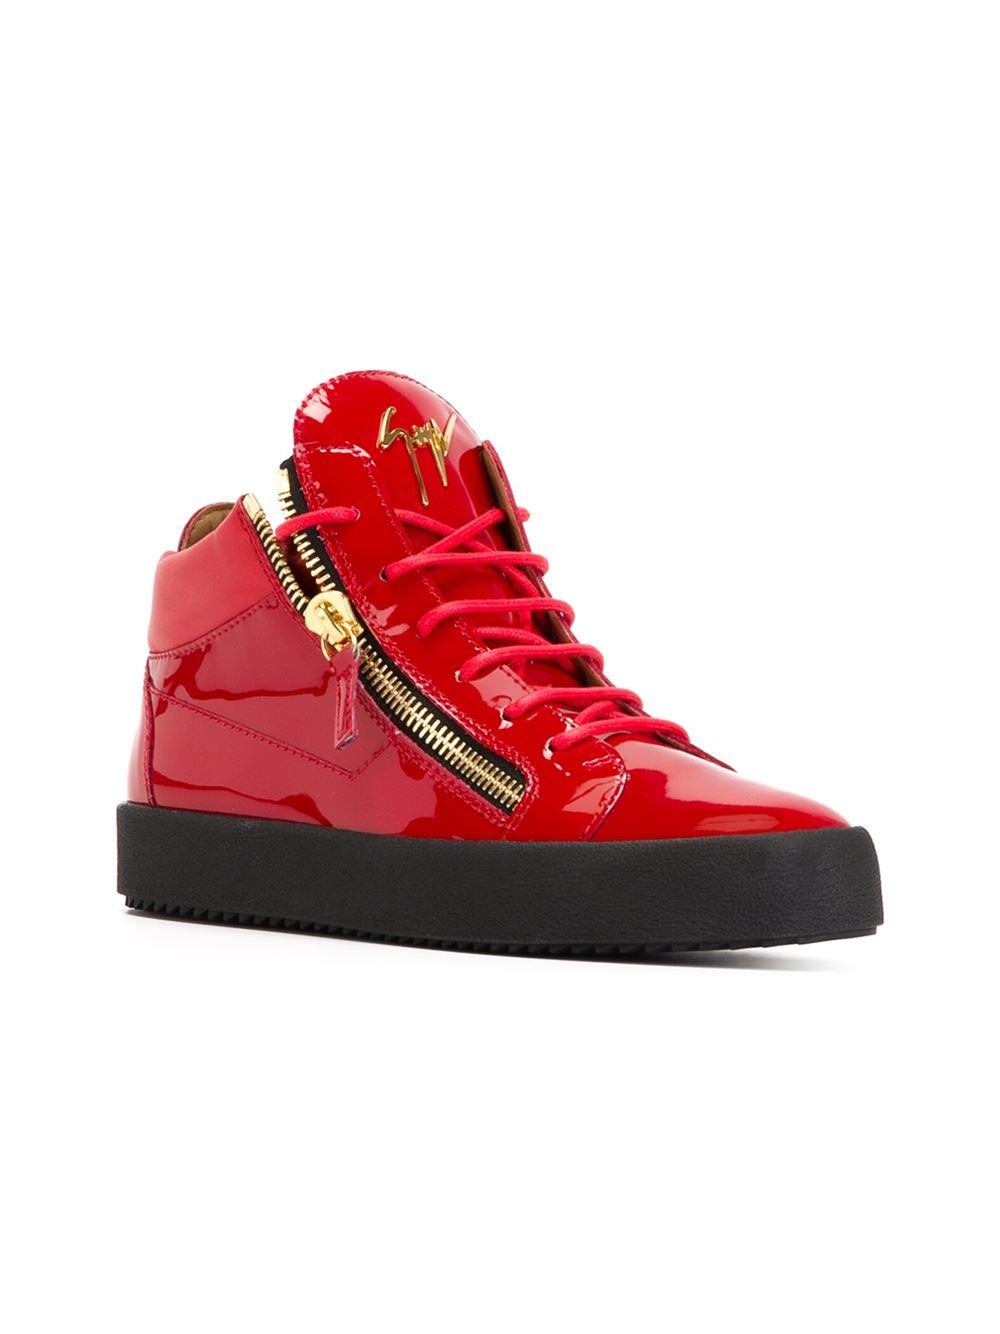 27375393b Giuseppe Zanotti 'vegas' Hi-top Sneakers in Red for Men - Lyst